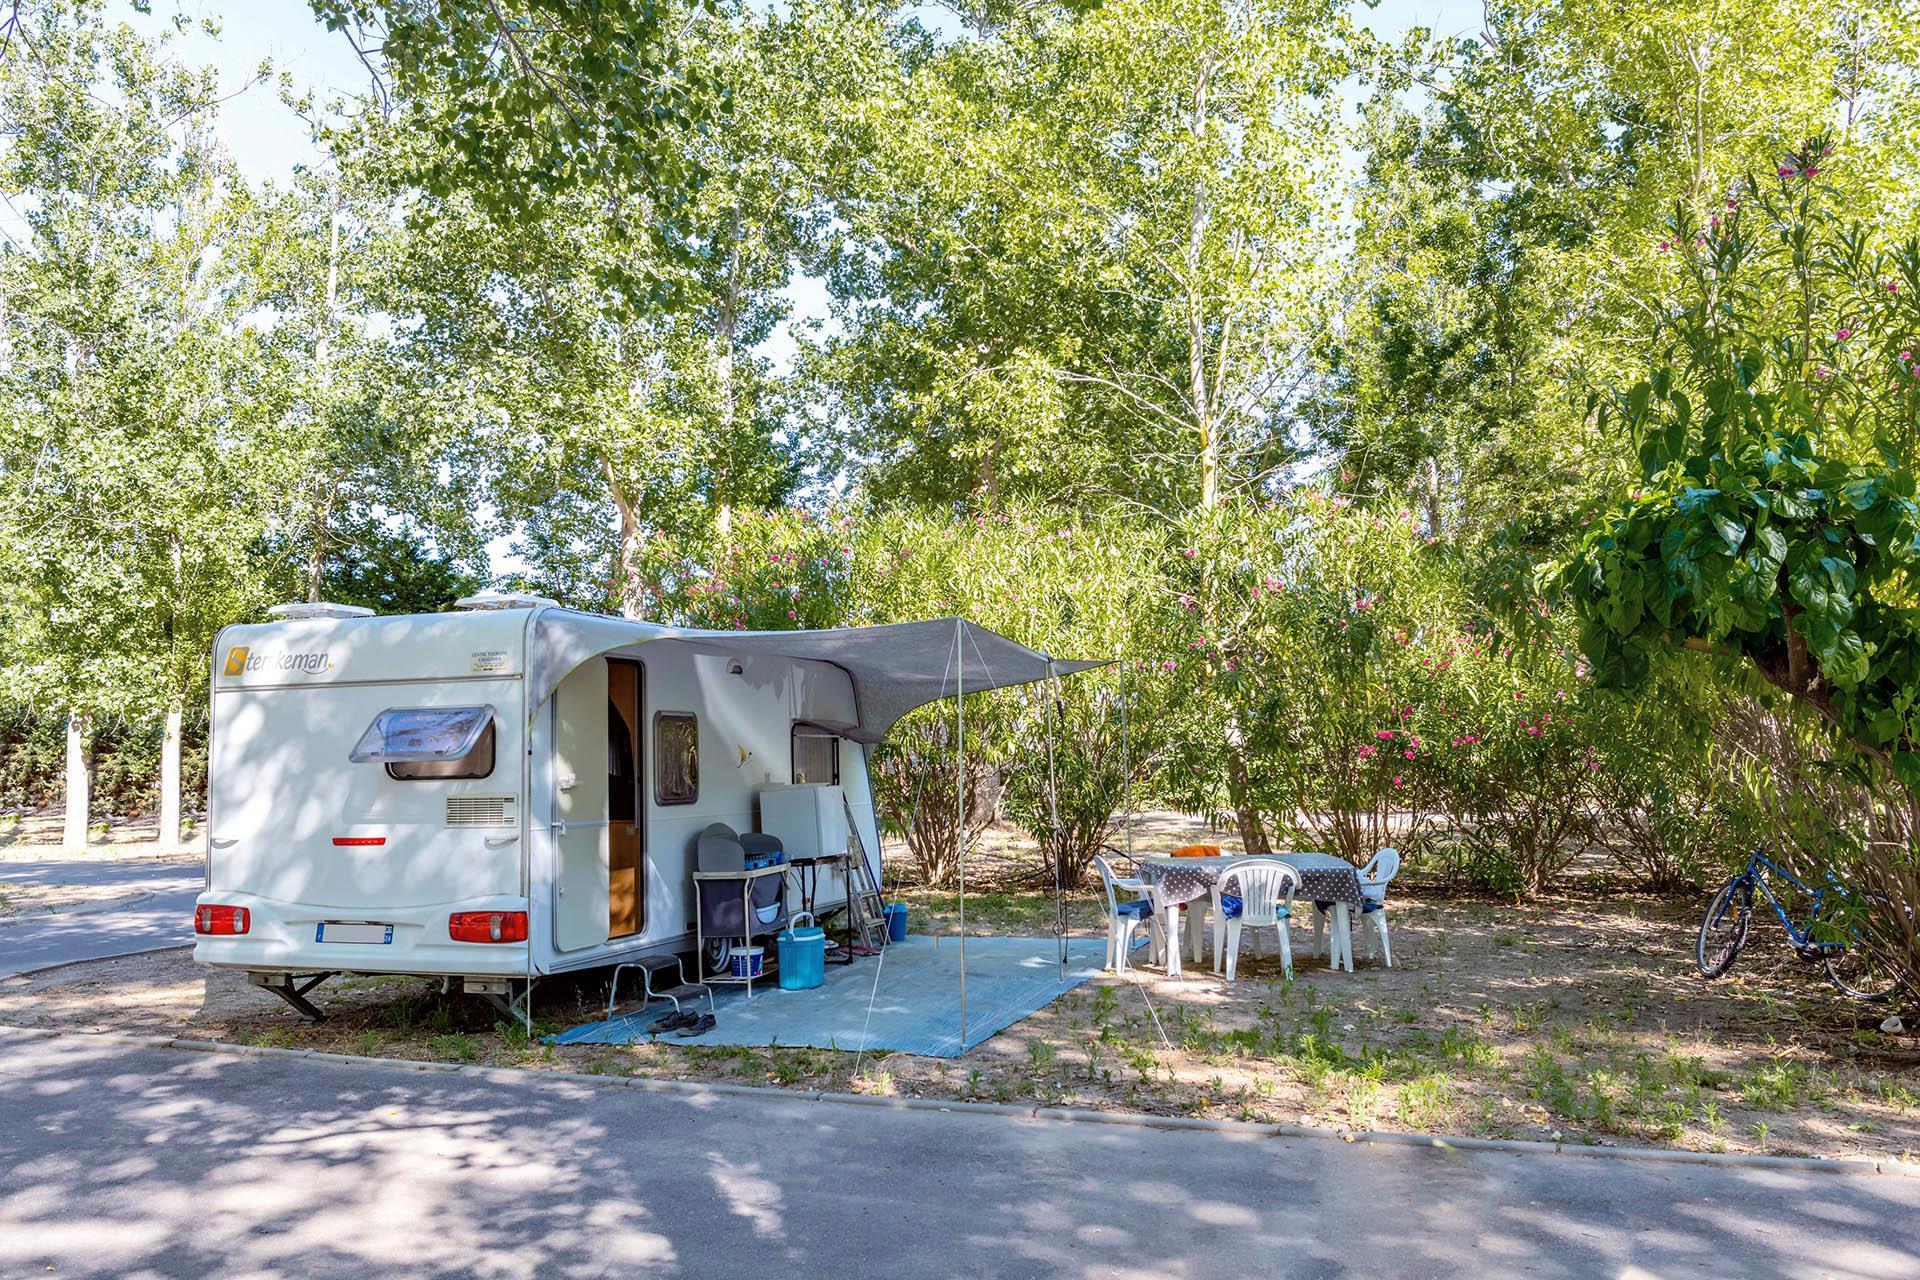 Emplacement - Forfait** - Camping Sandaya Les Vagues